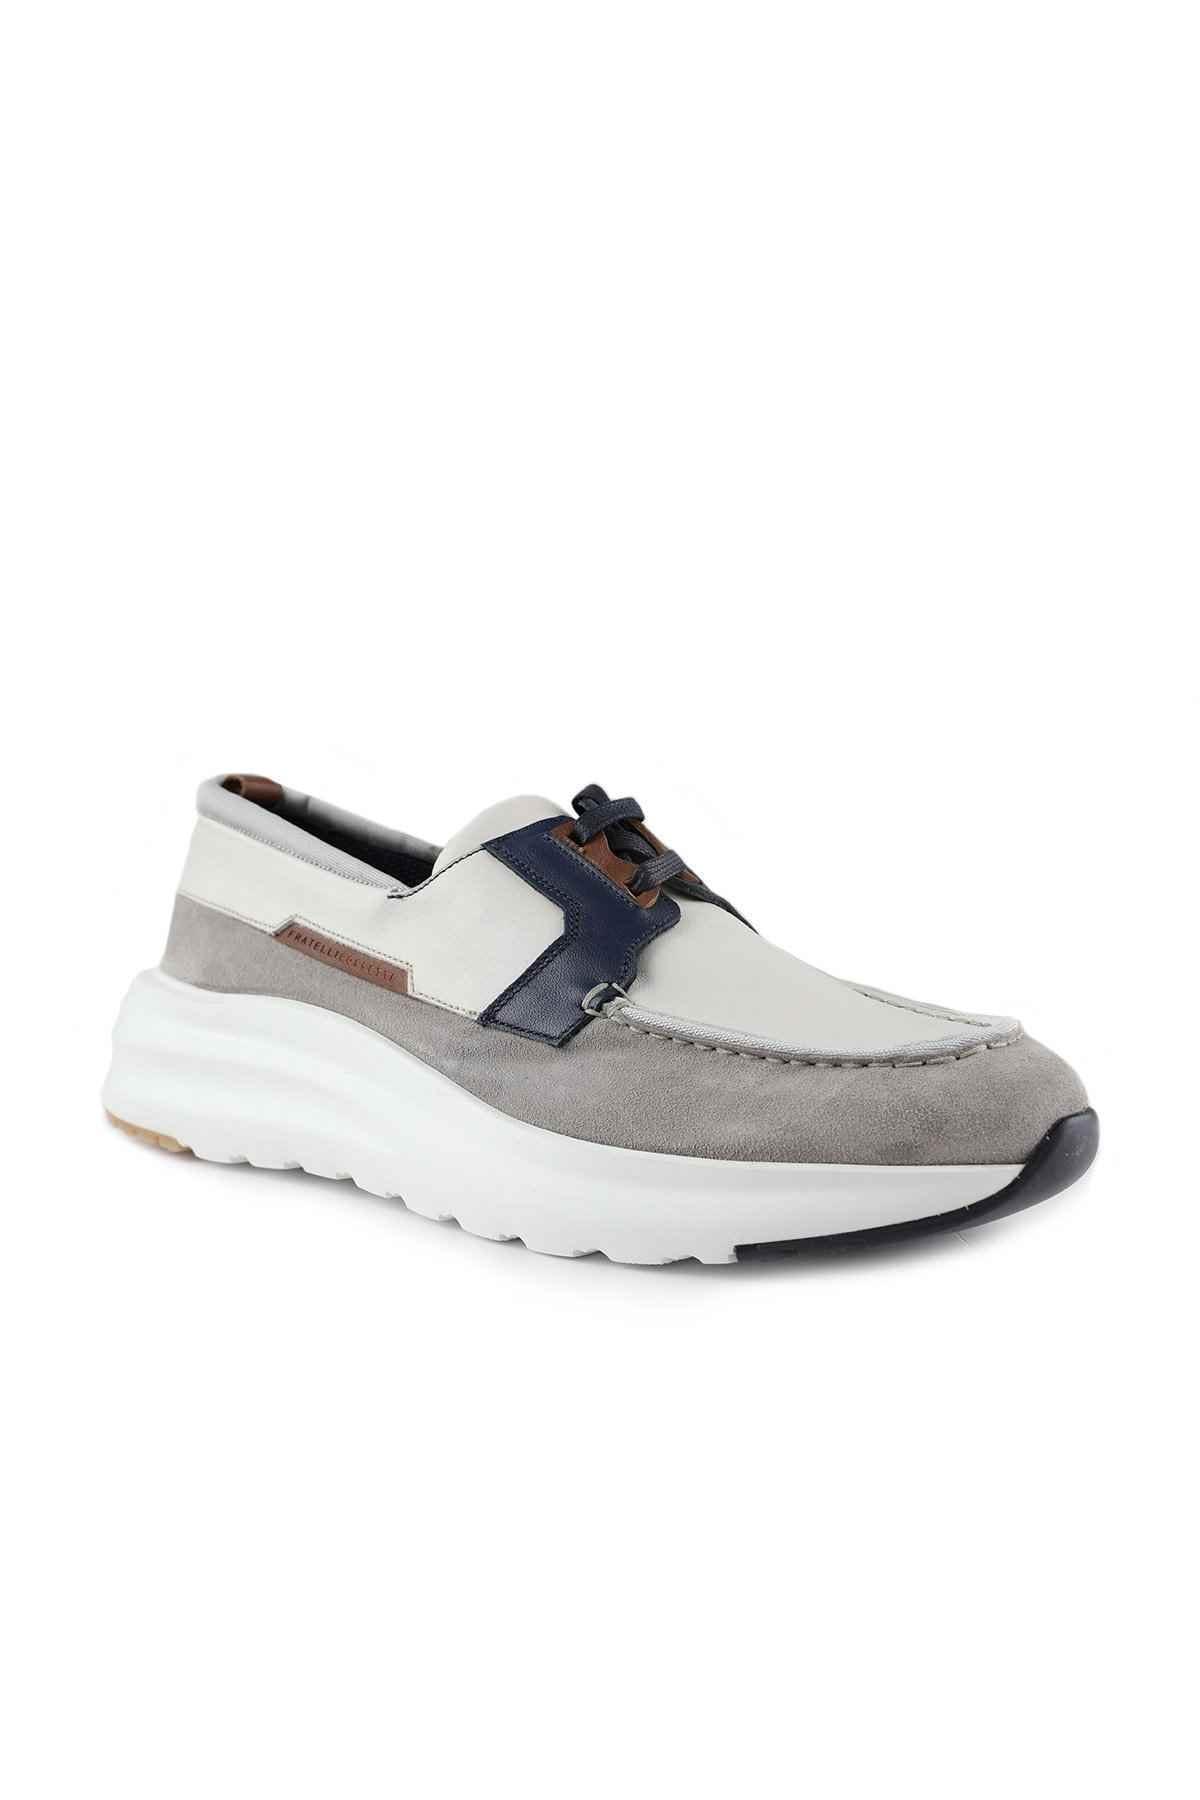 Fratelli Rossetti Erkek Sneaker Ayakkabı 2